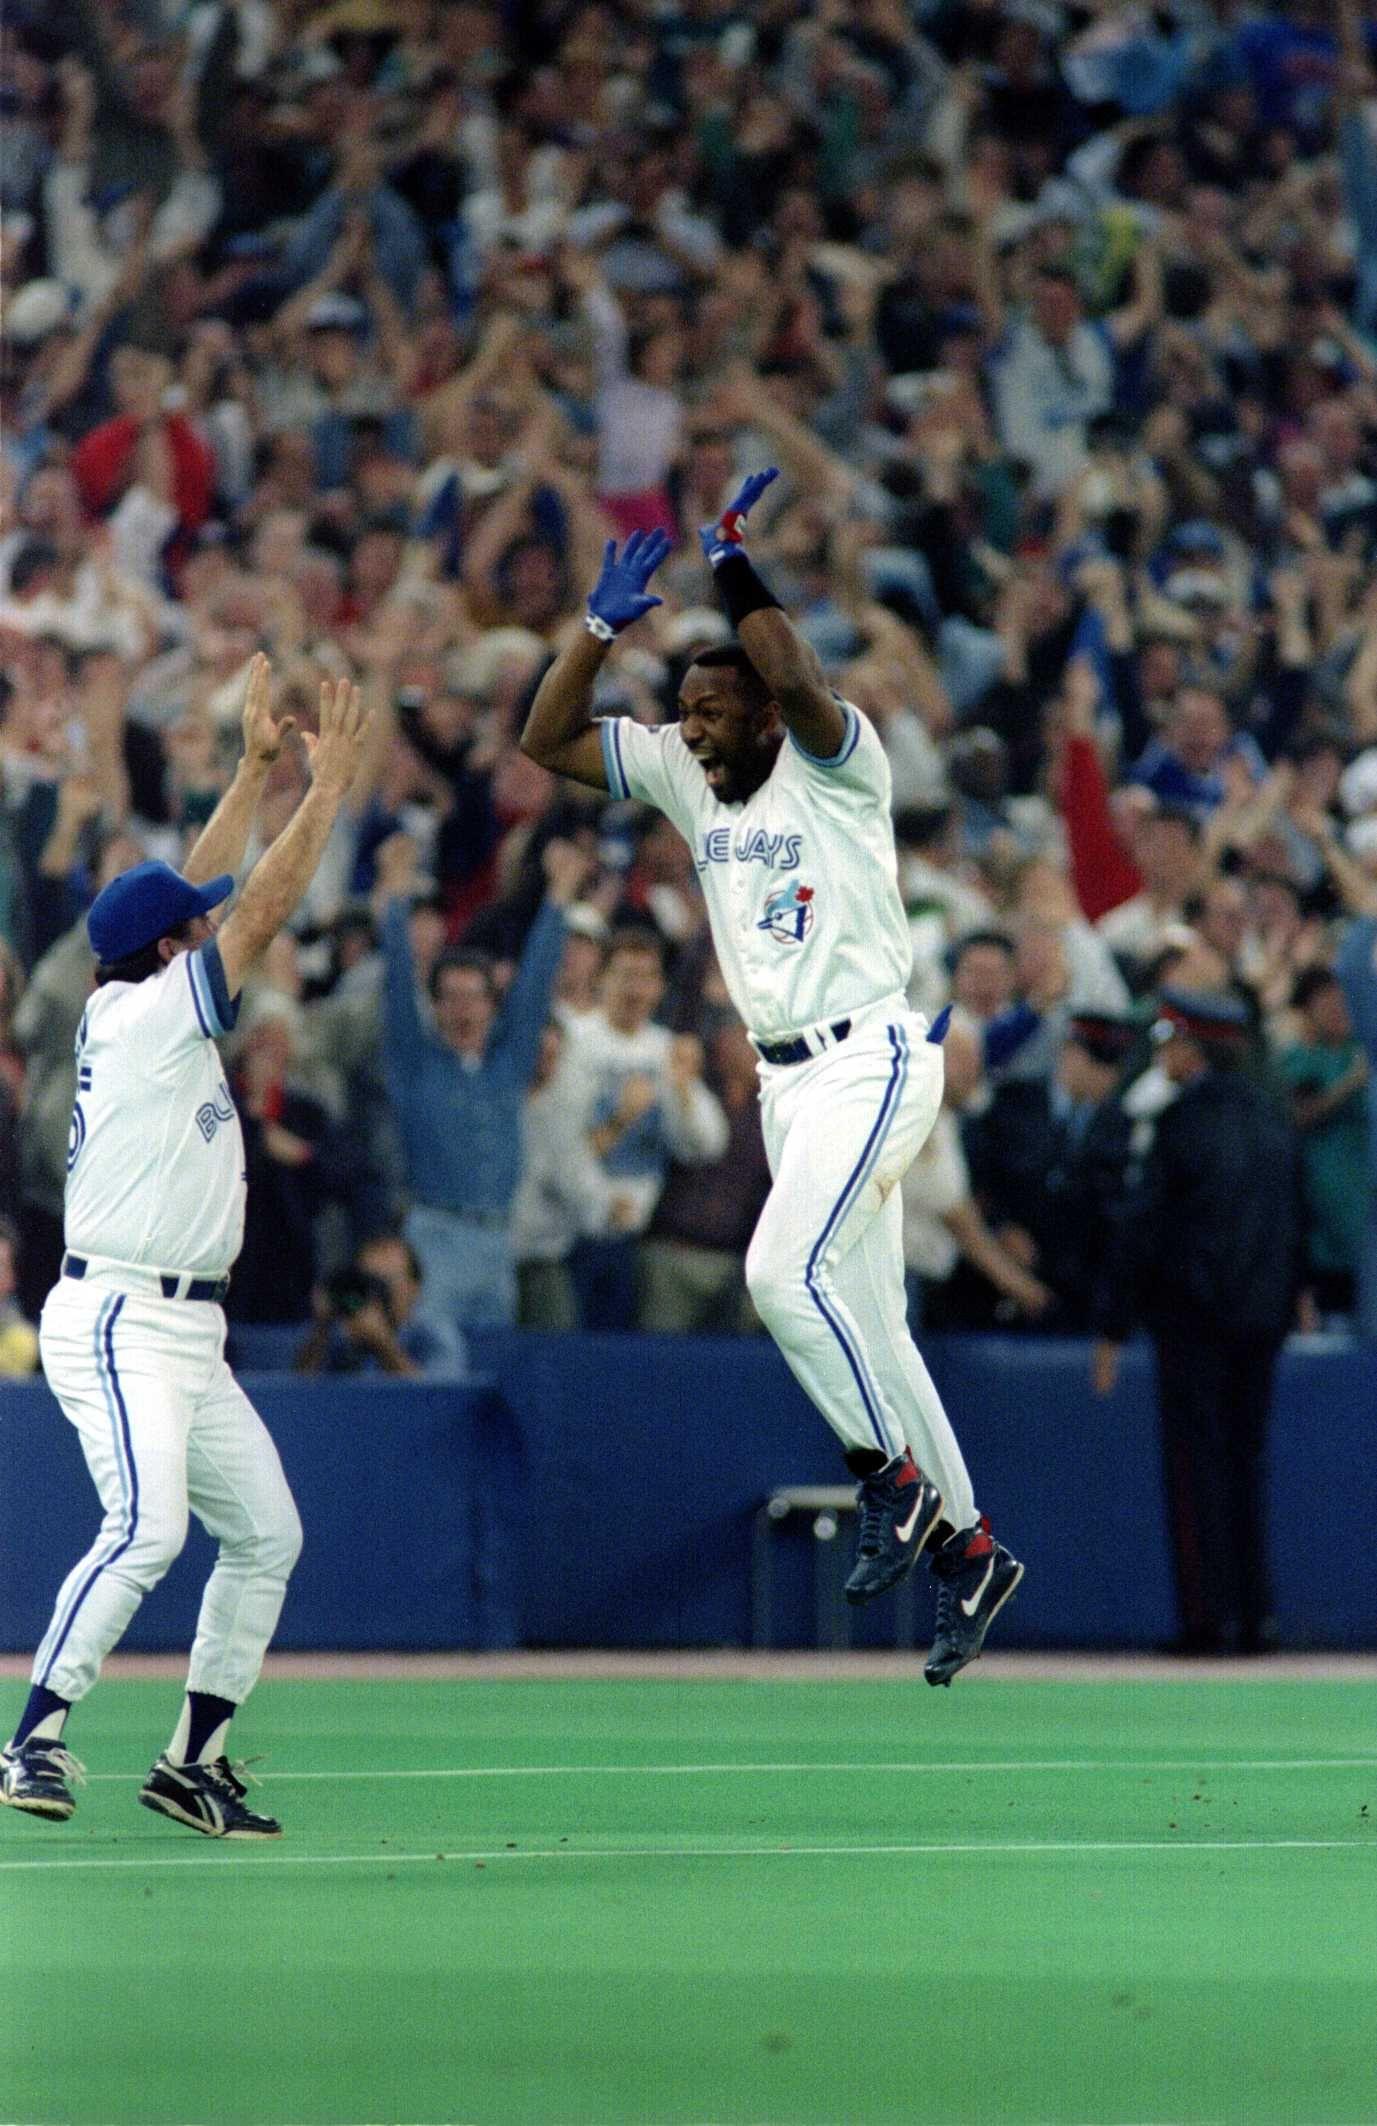 Joe Carter celebrates his 9th inning, three-run home run.